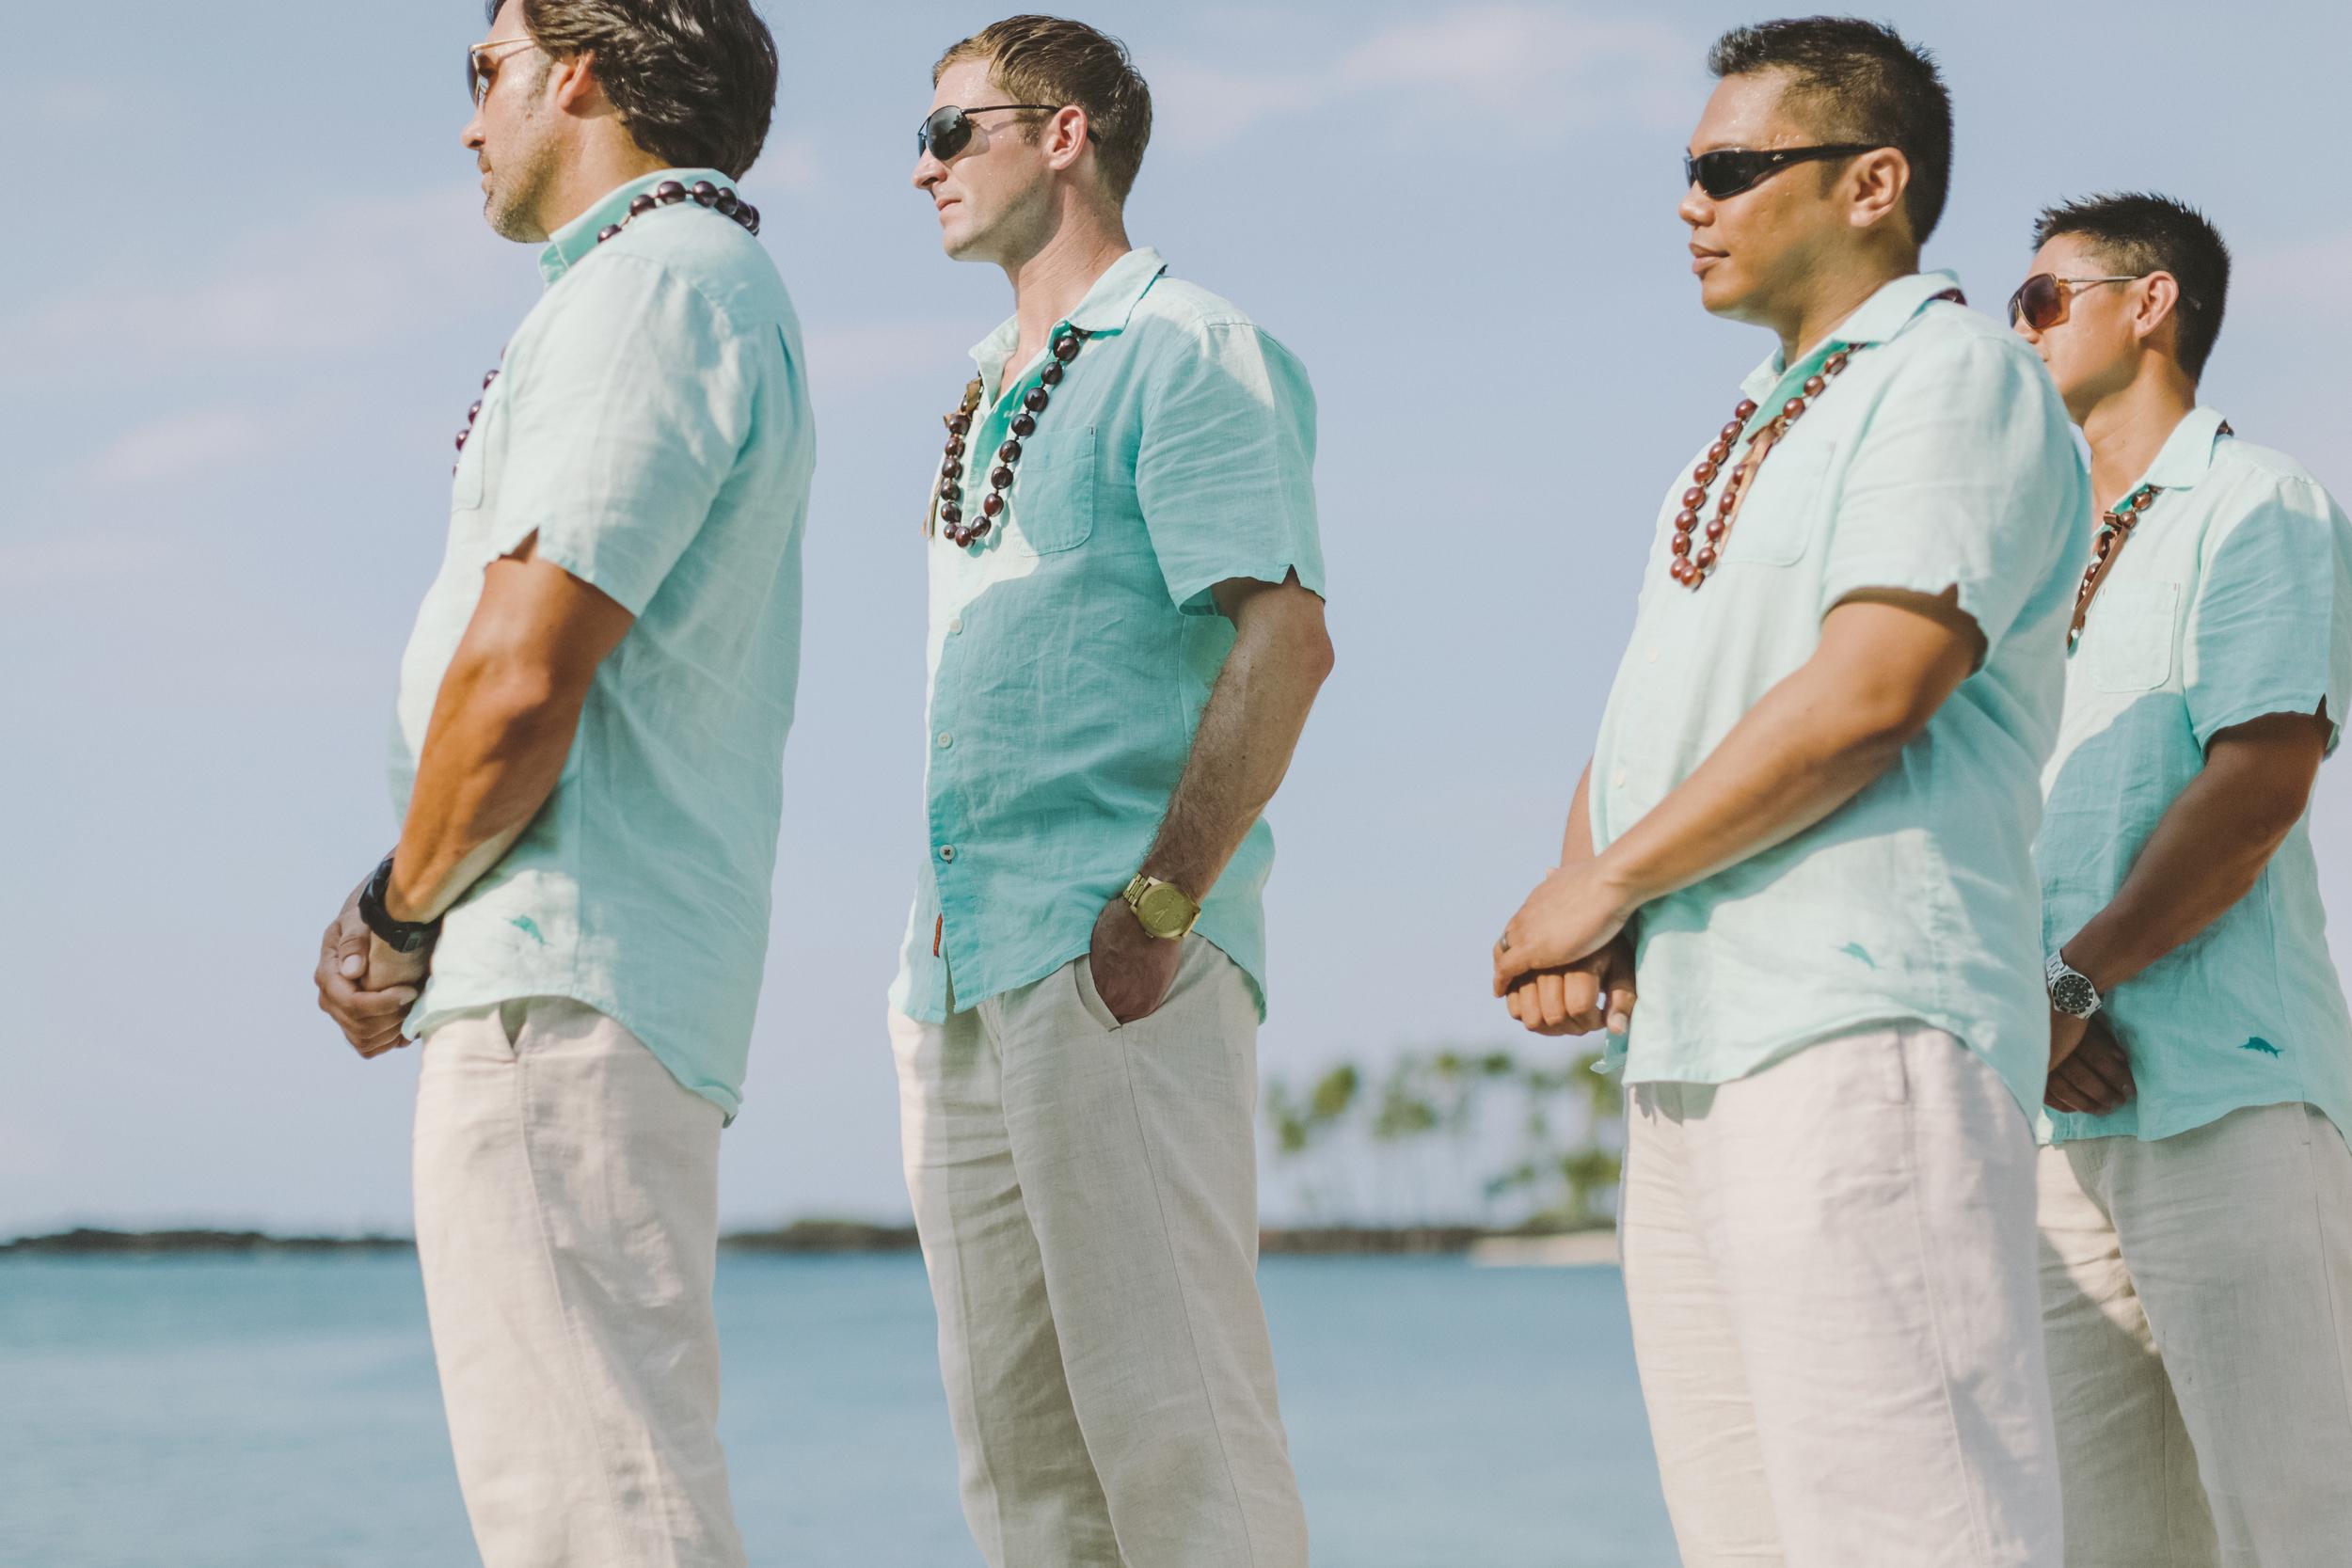 angie-diaz-photography-hawaii-wedding-photographer-kelli-jay-60.jpg